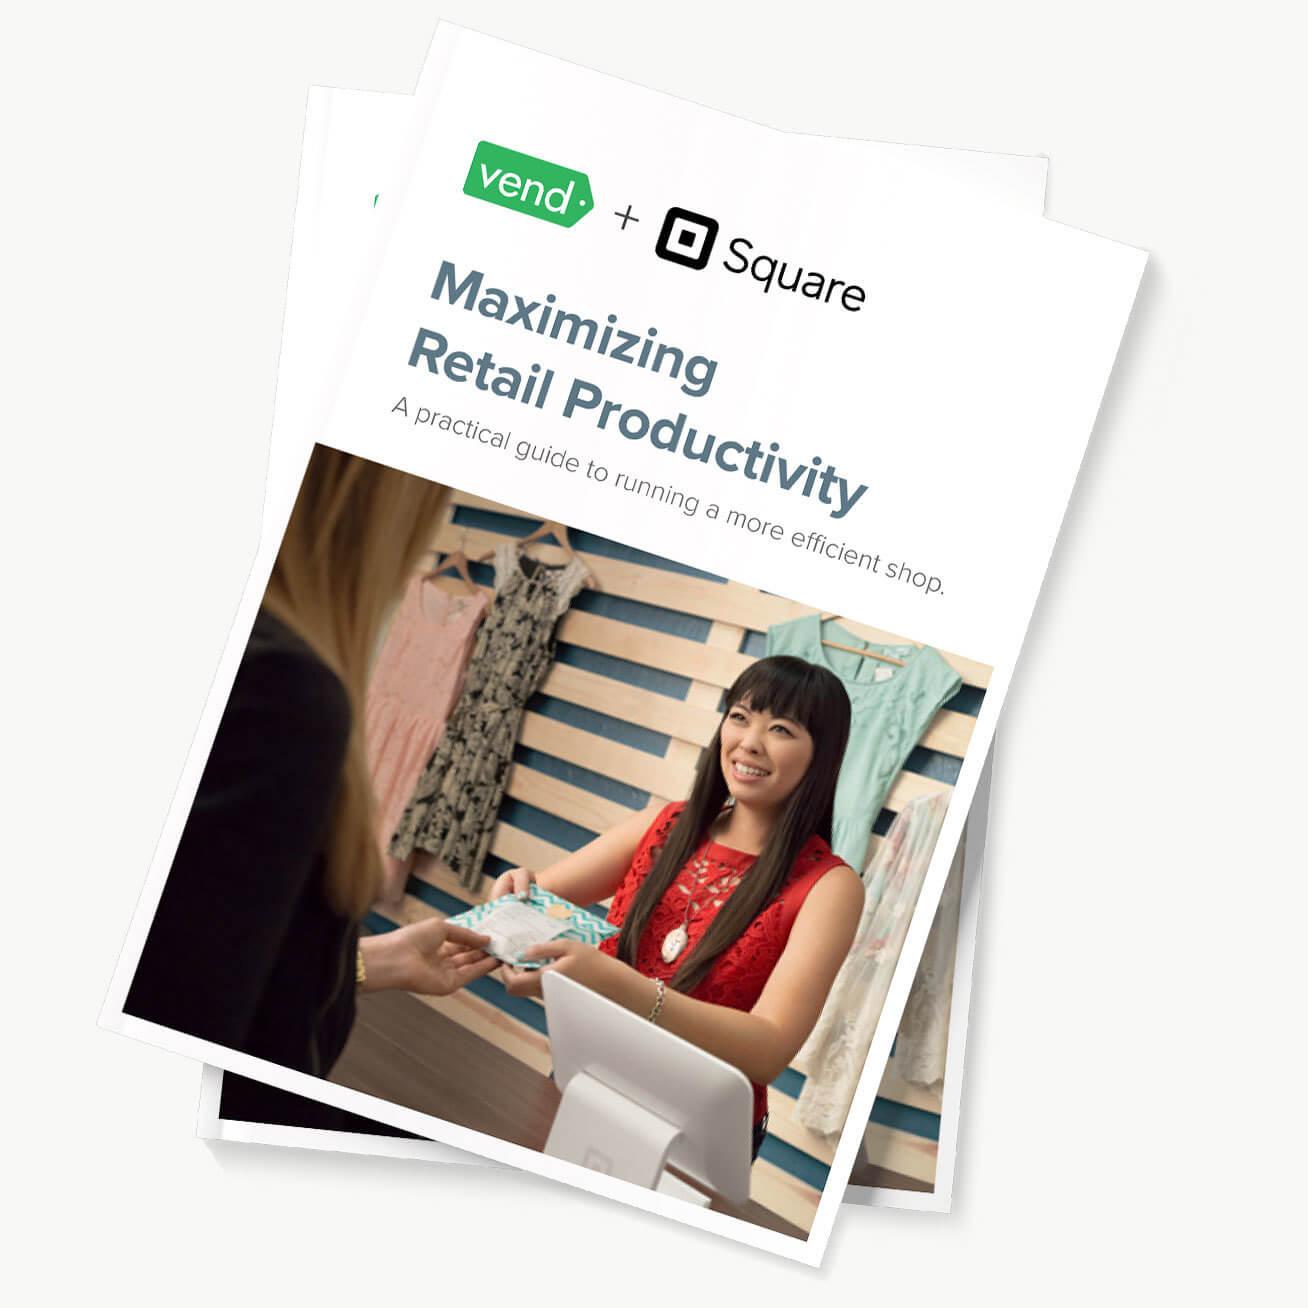 Retail productivity1